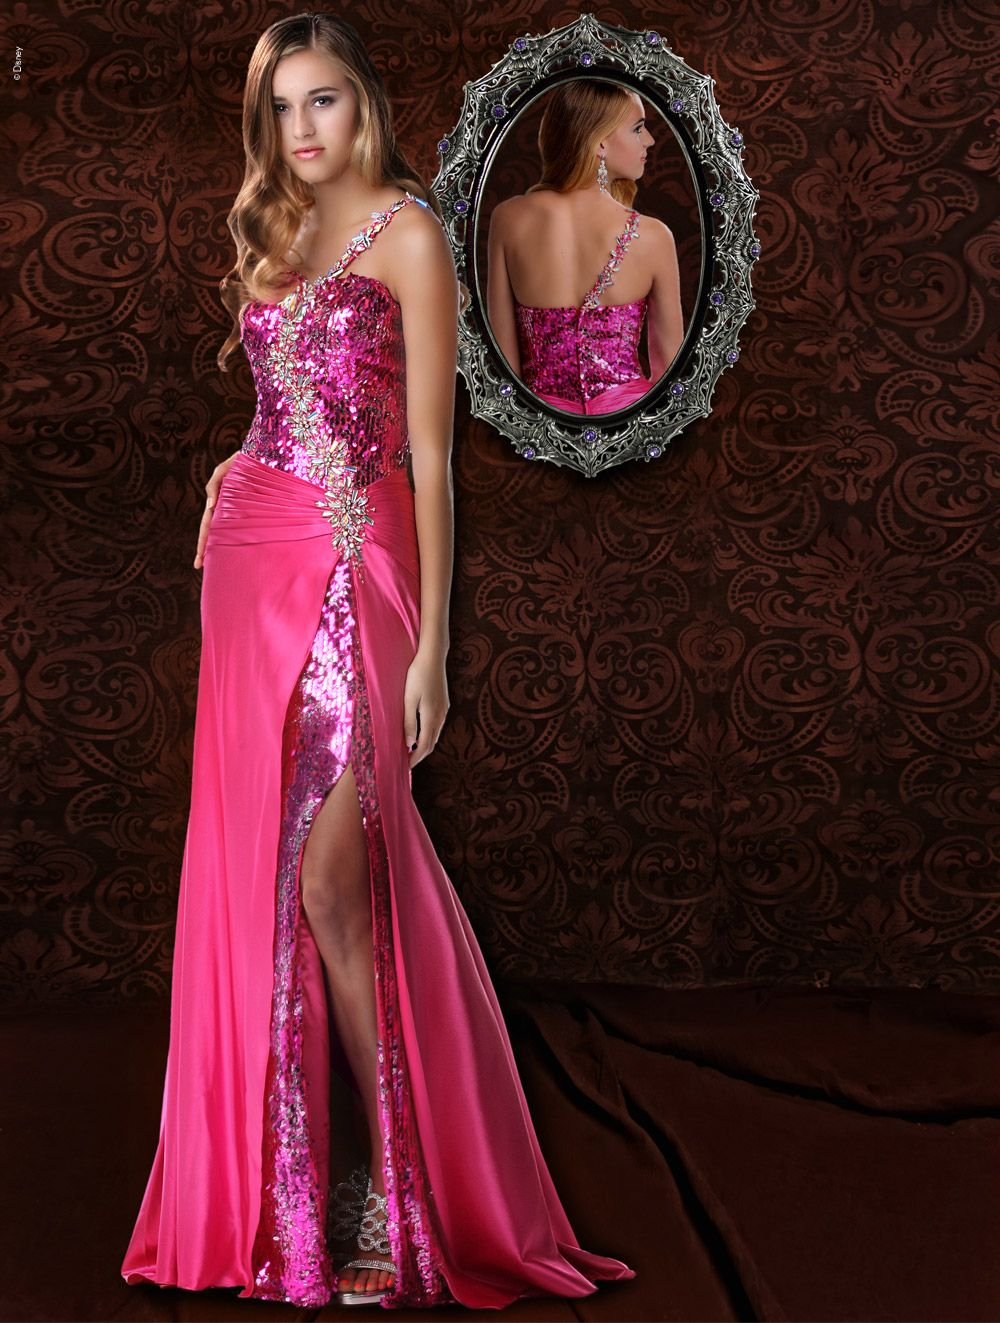 Disney Forever Enchanted Prom Dresses Disney Prom Dresses Dresses Prom Dresses